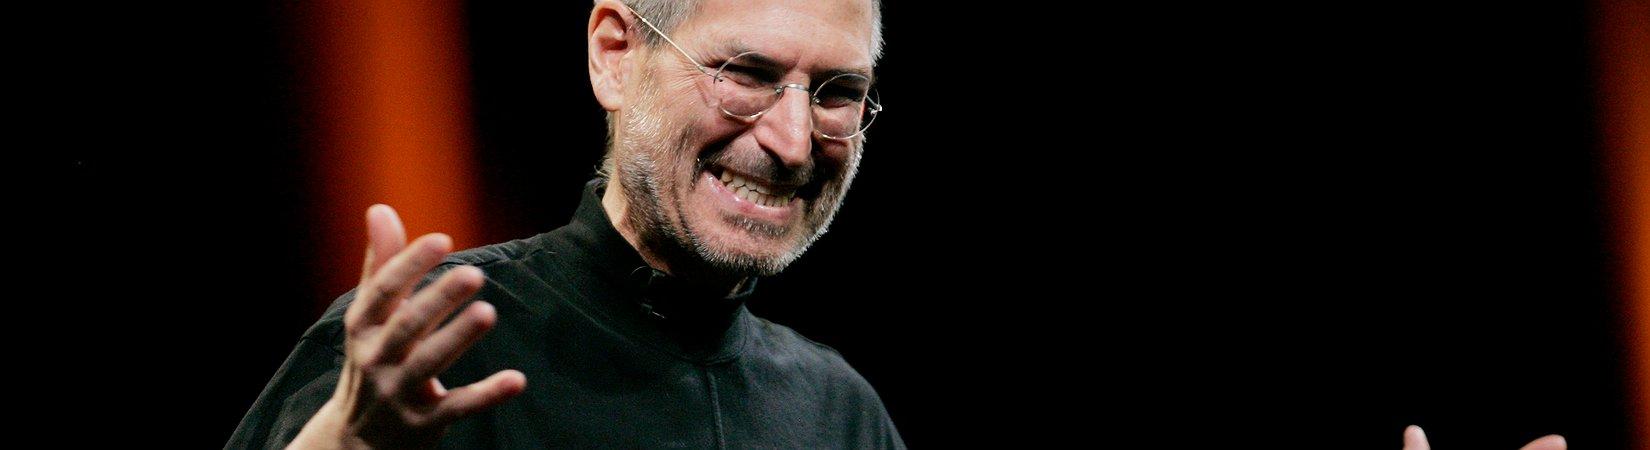 Cómo tener éxito en tu carrera: el secreto de Steve Jobs